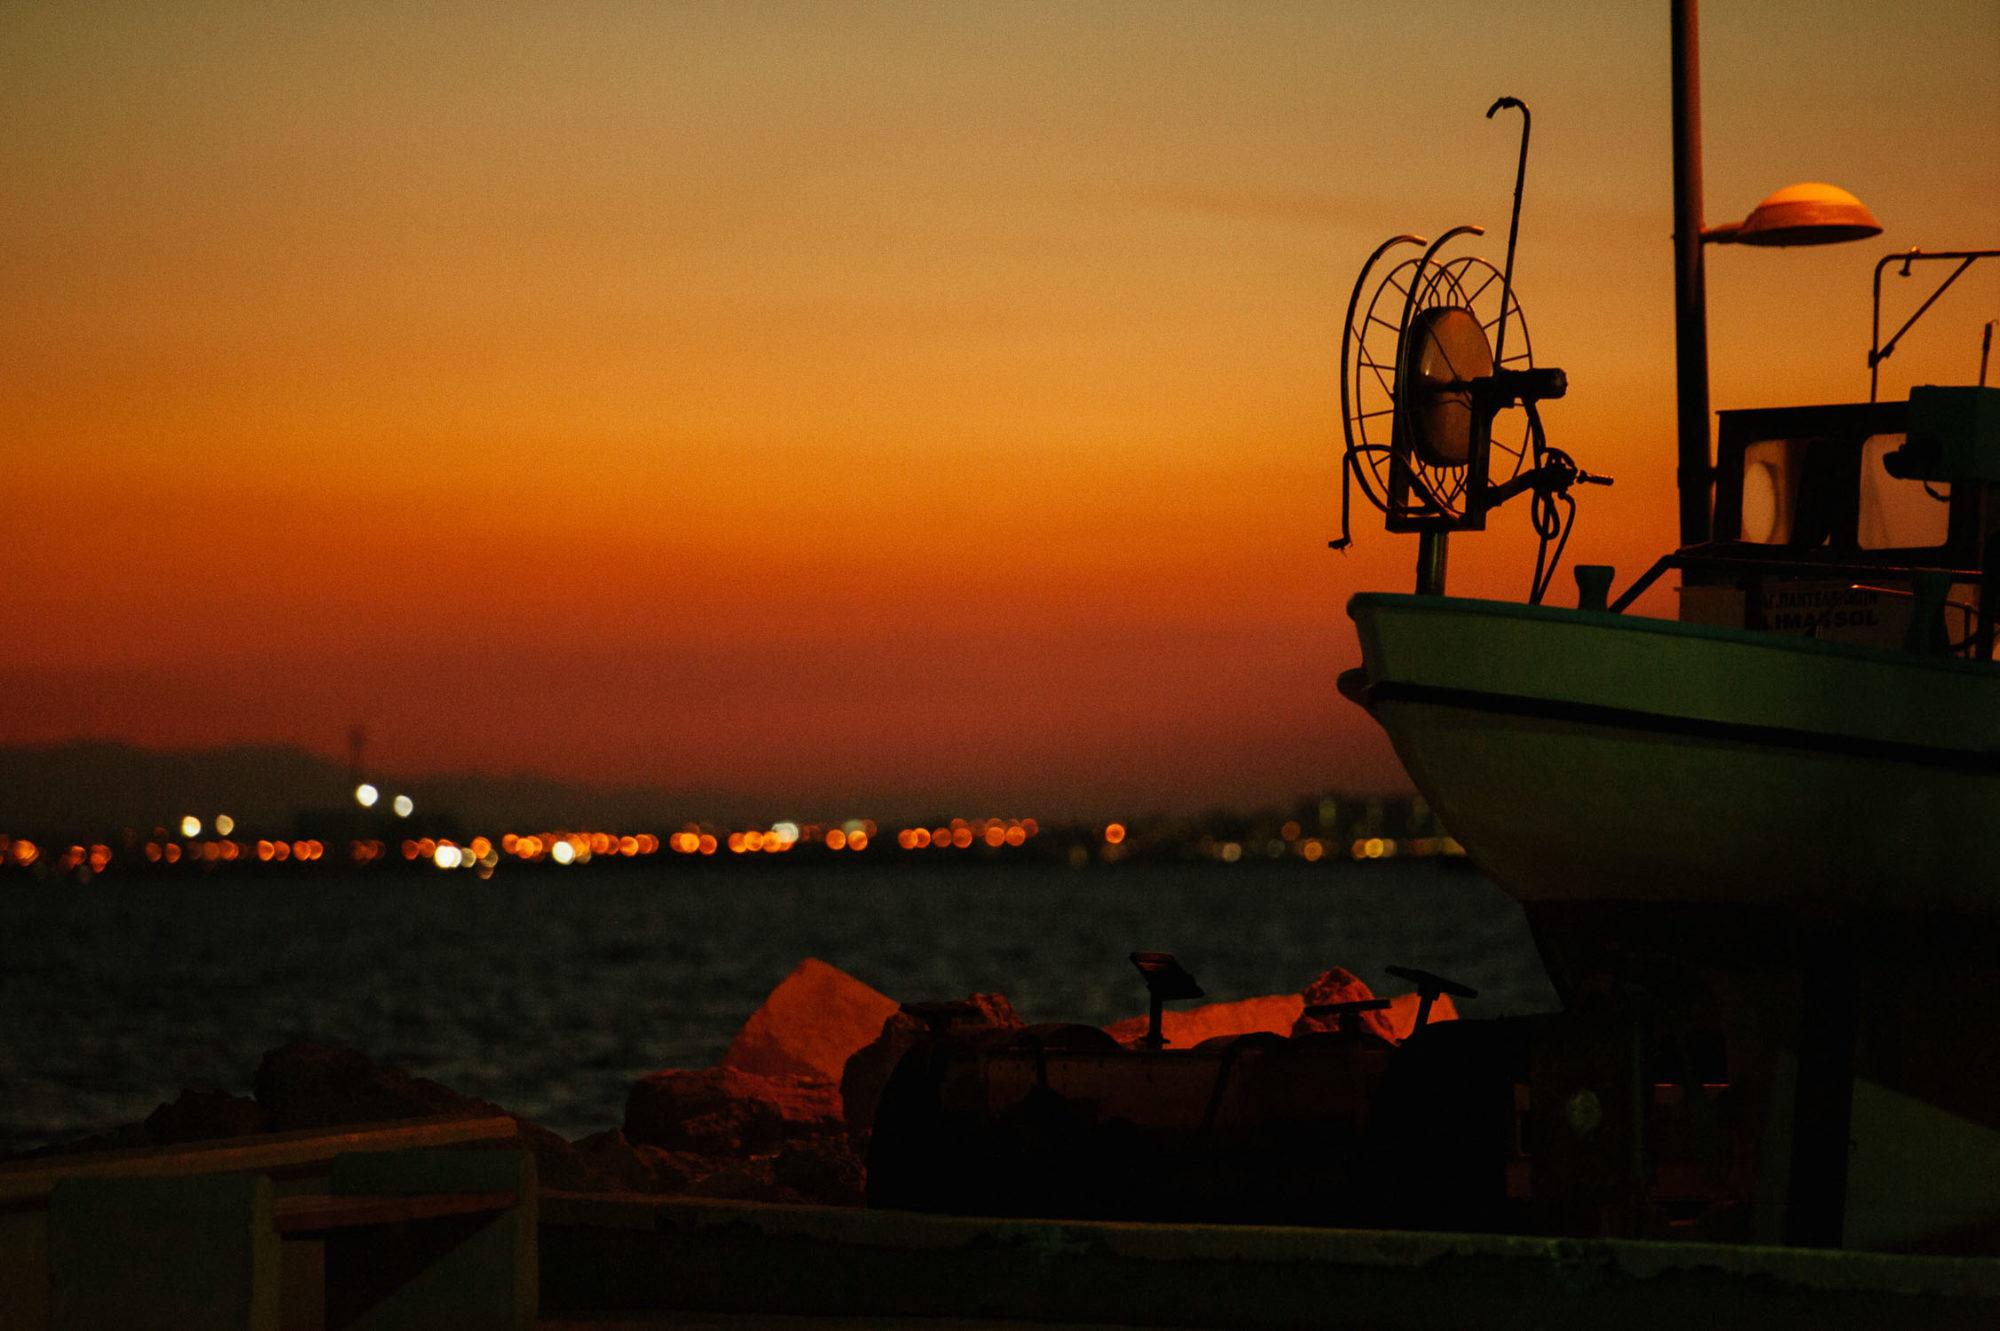 Cypr nocą. Port.